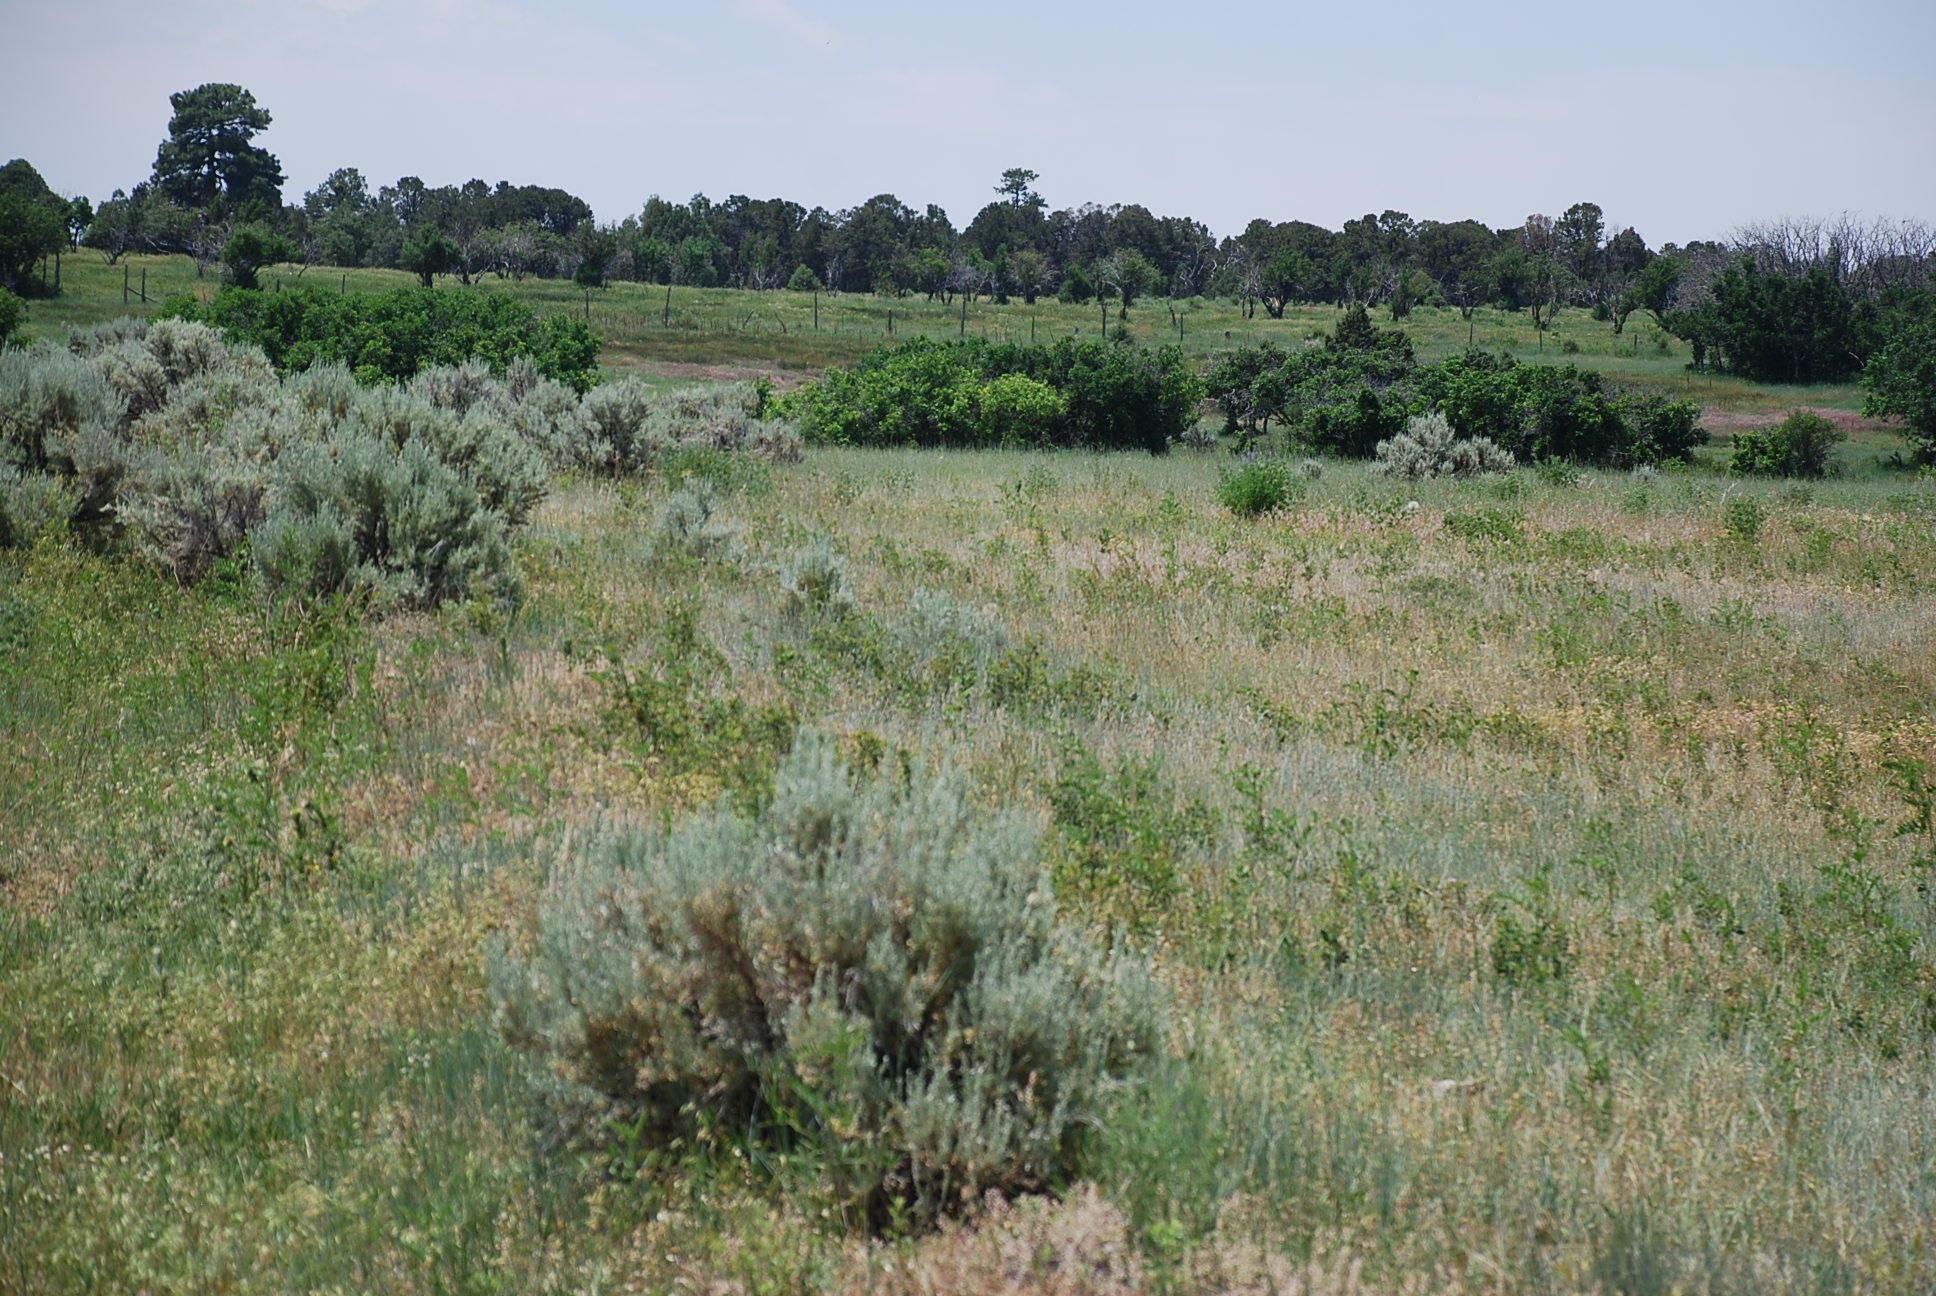 933 Bear Paw Rd., Bear Paw Ranch Property Photo 14